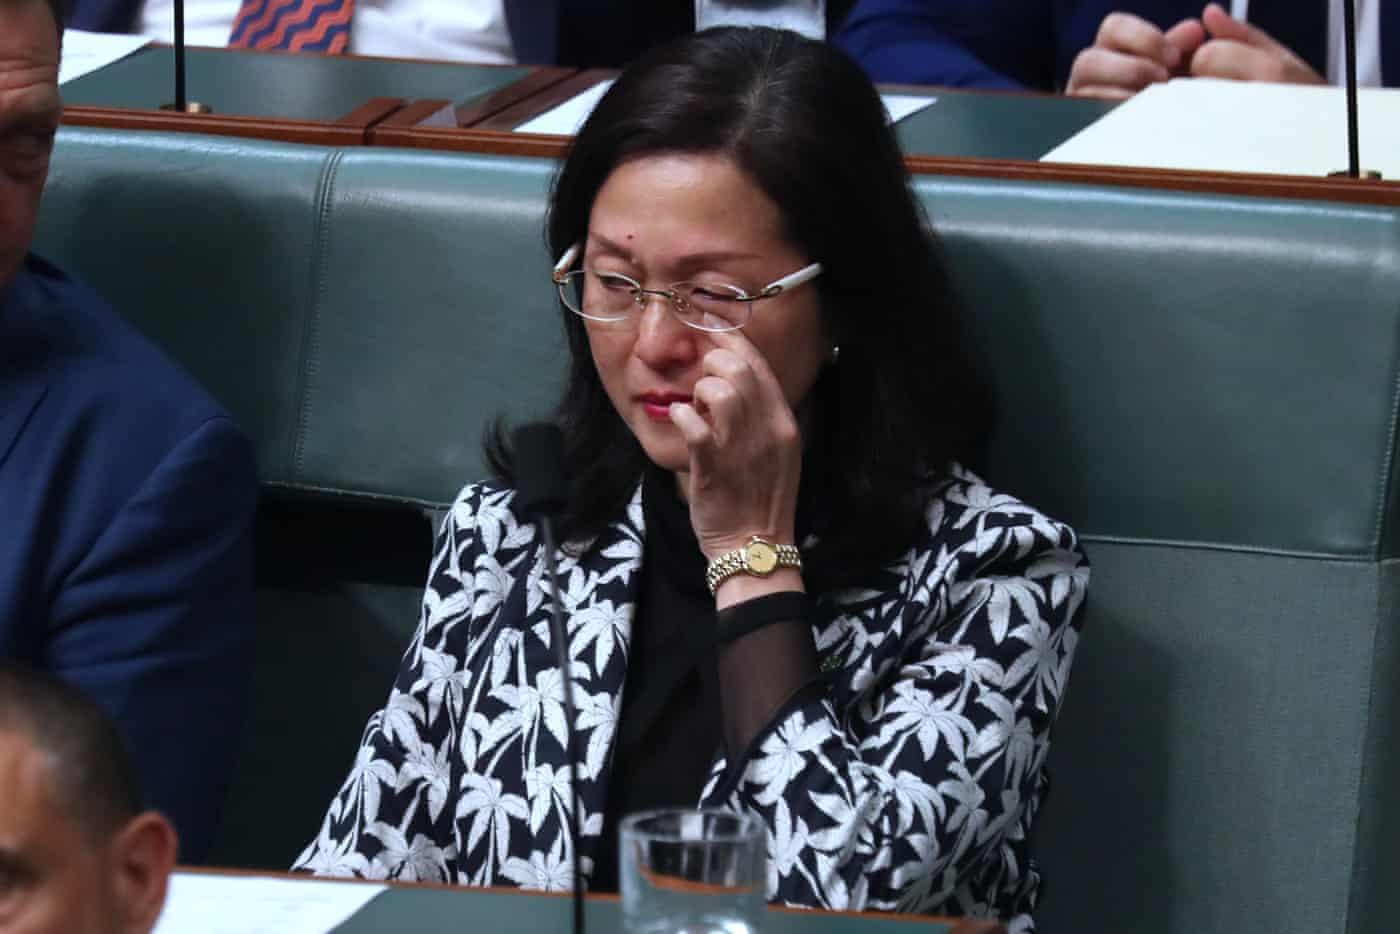 Scott Morrison says Gladys Liu is 'a great Australian' – as it happened